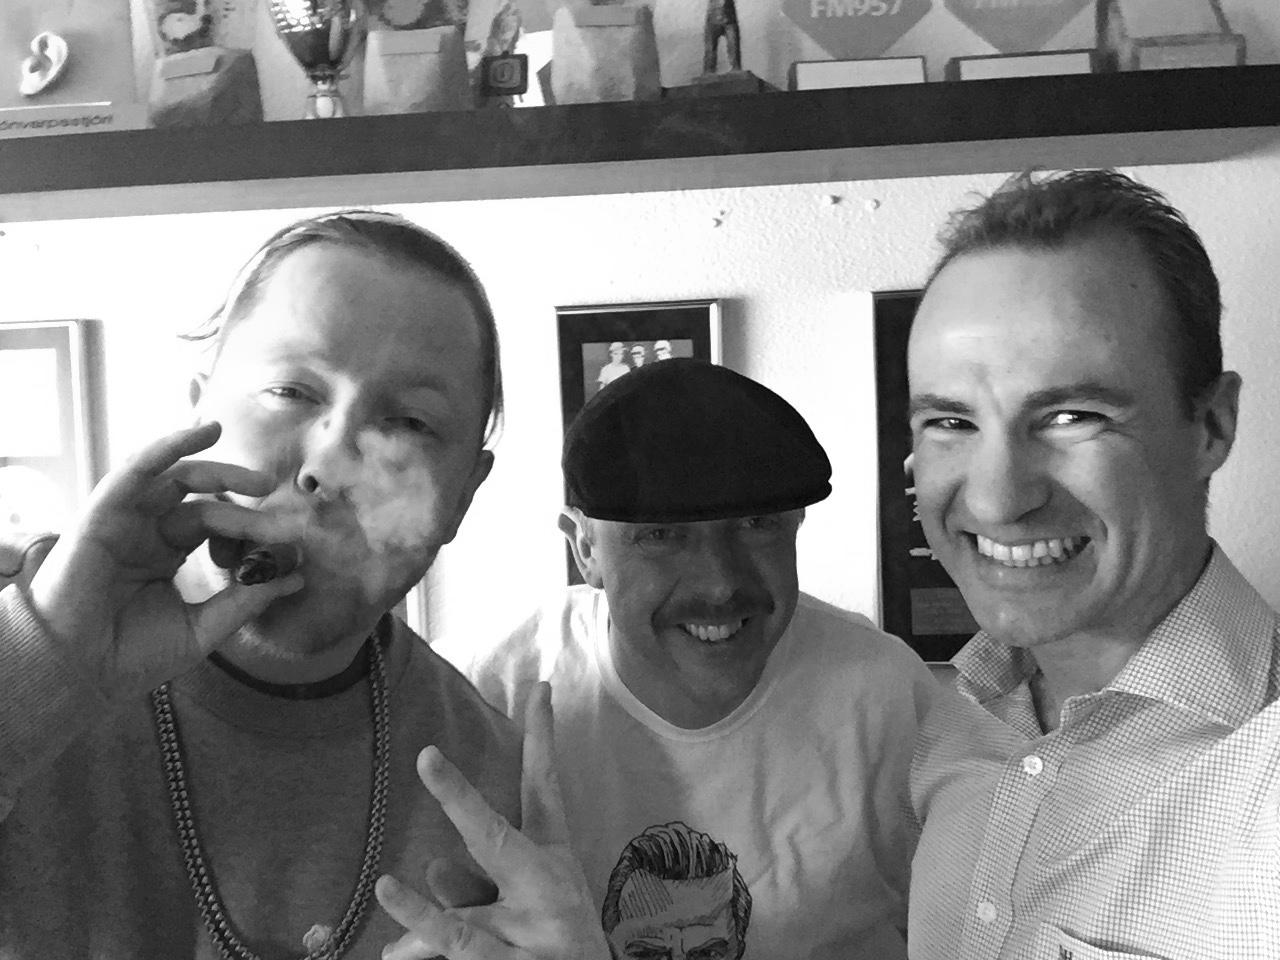 Interview rapper Blaz Roca with brother Sesar A